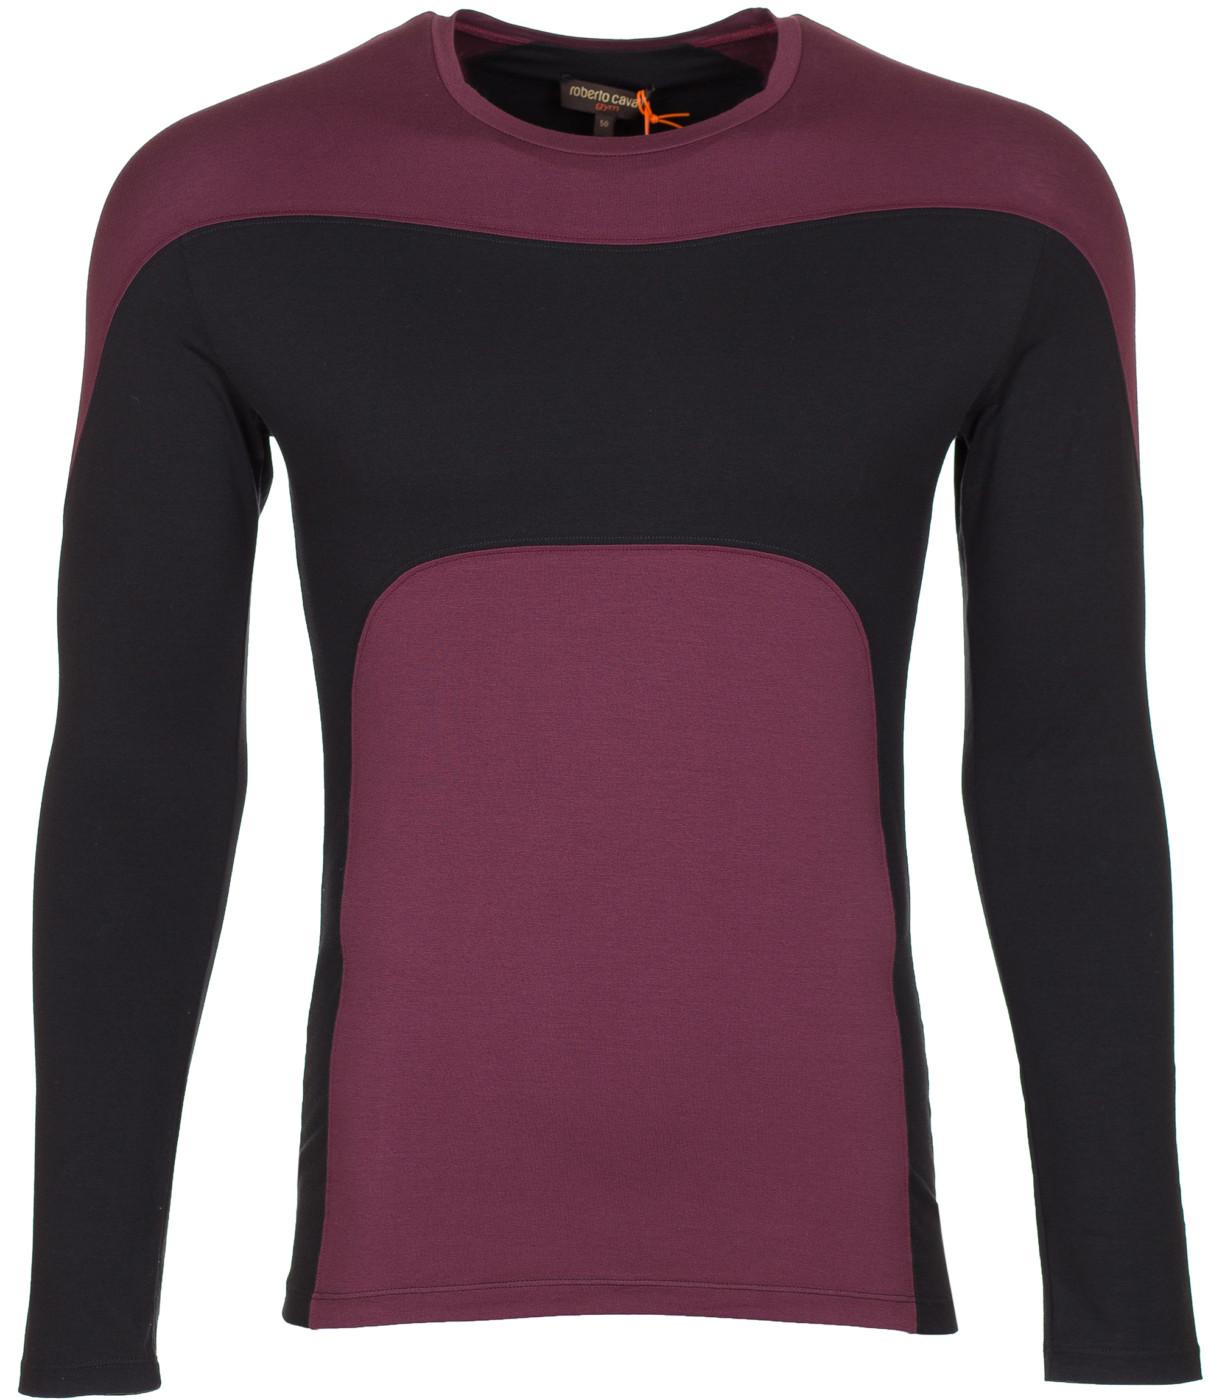 8f37ca297941 Roberto Cavalli Gym Men s Black Red Cotton Crew Neck Long Sleeve T-Shirt